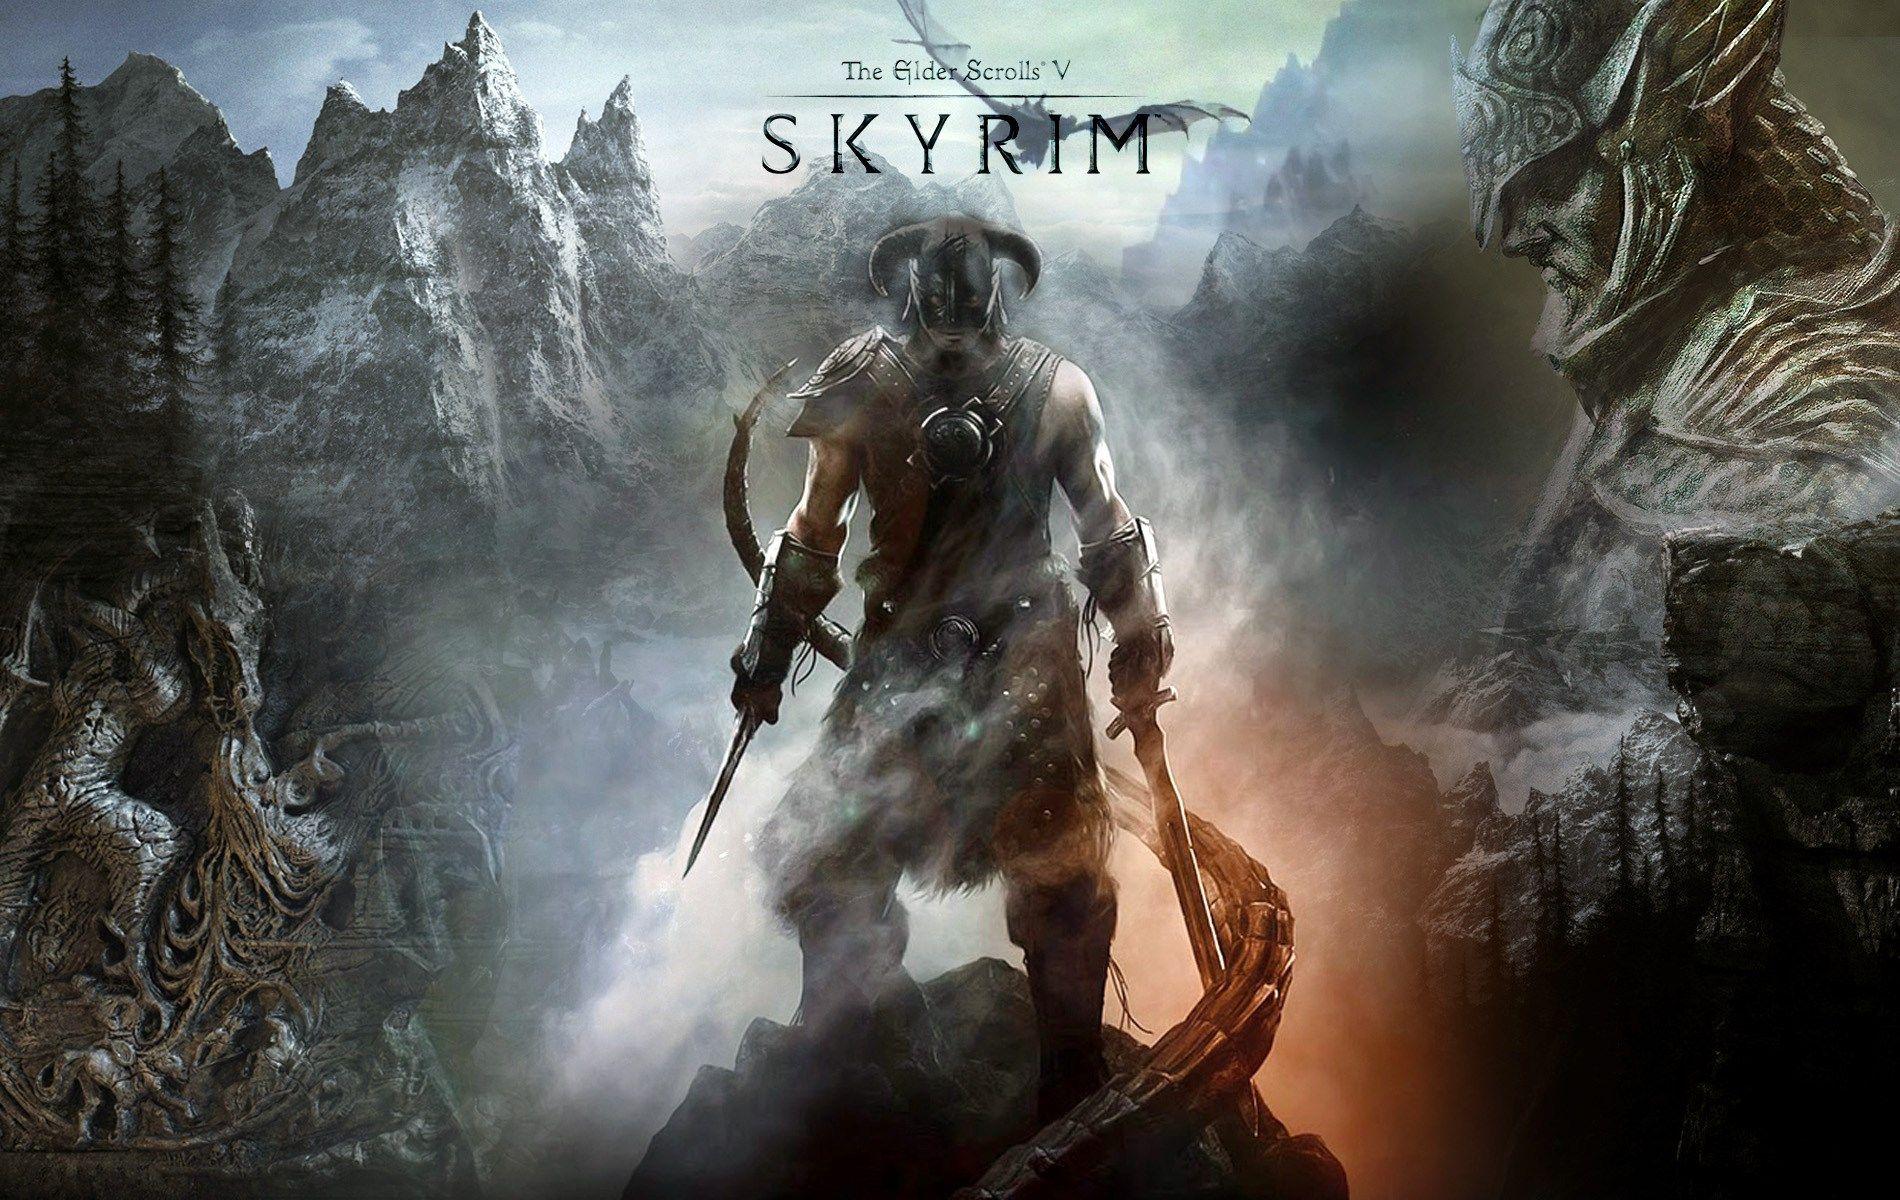 The Elder Scrolls V Skyrim Hd Wallpaper Skyrim Skyrim Xbox Elder Scrolls